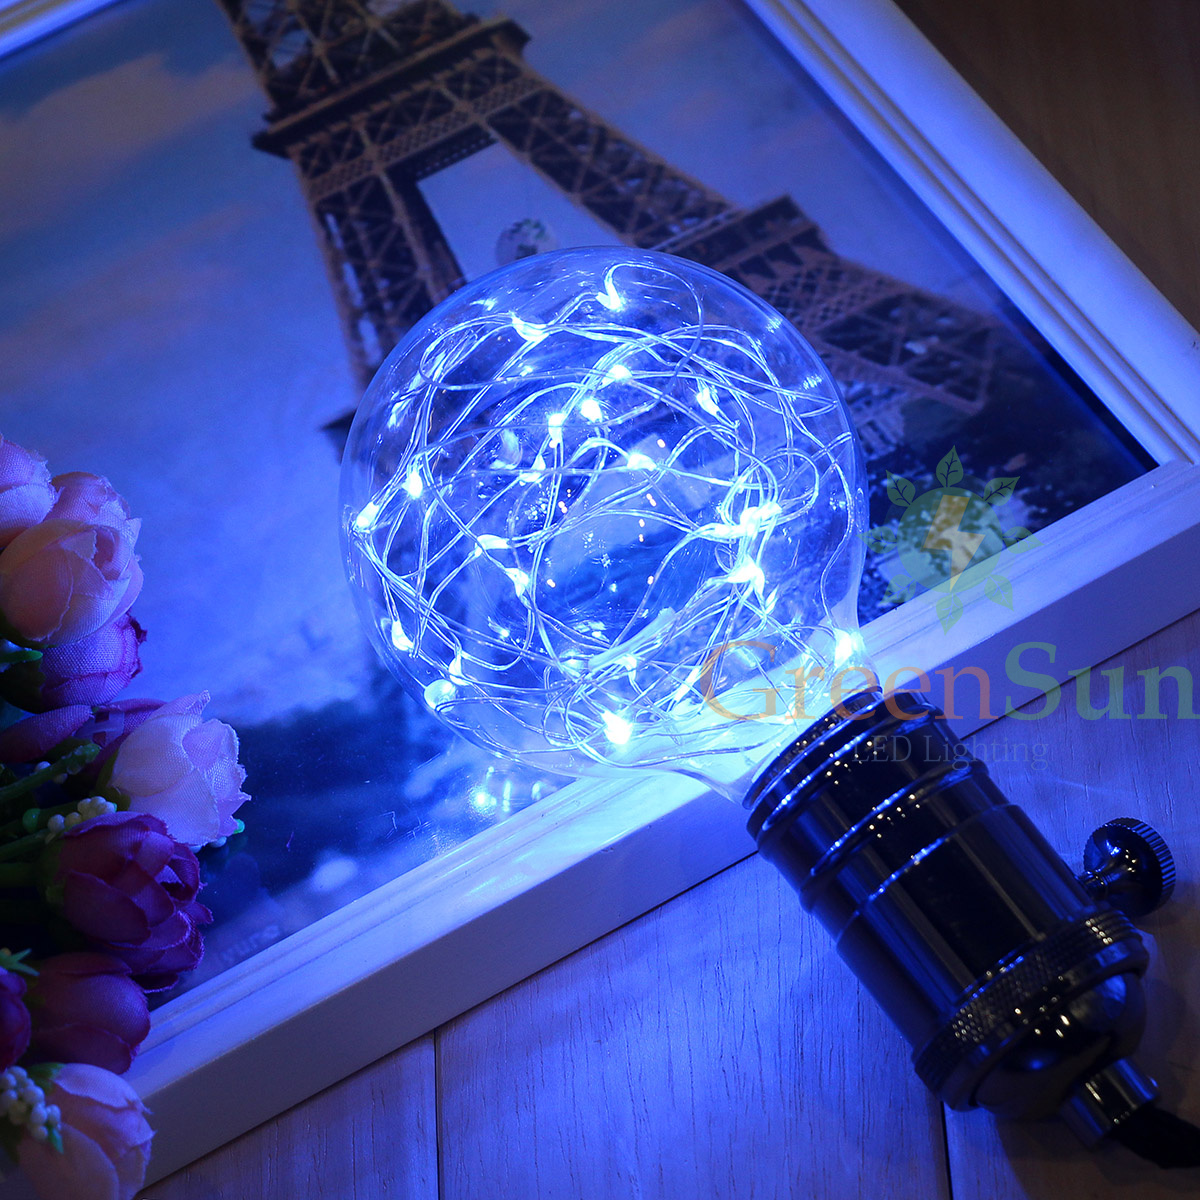 edison e27 led deko stern kugel lichterkette leuchtmittel dekoleuchte nachtlicht ebay. Black Bedroom Furniture Sets. Home Design Ideas